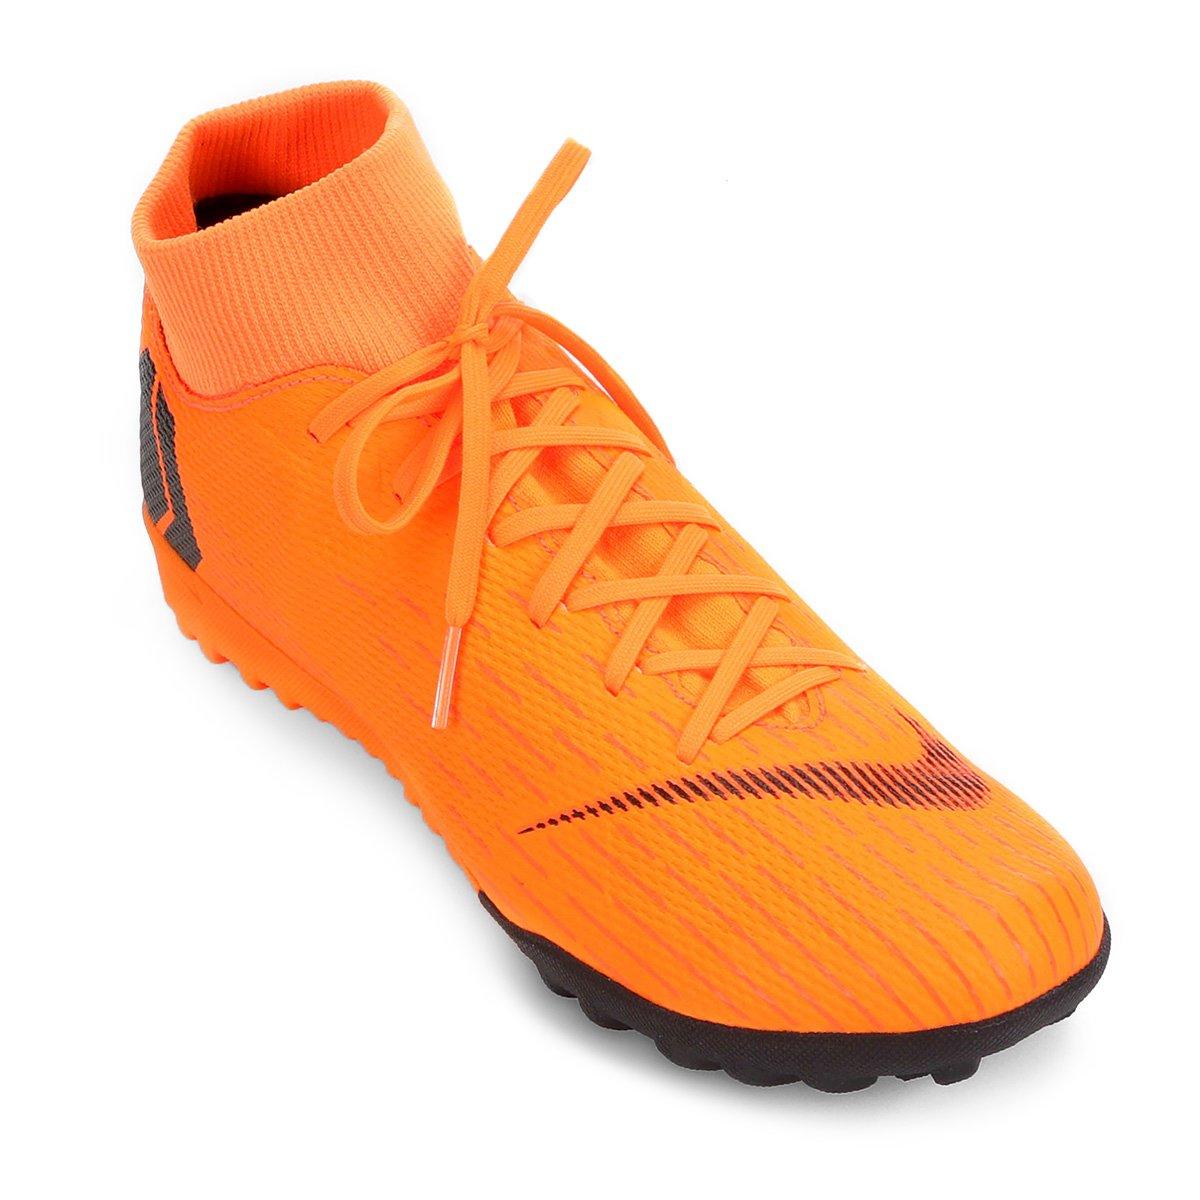 bb88d4e794a37 Chuteira Society Nike Mercurial Superfly 6 Academy - Laranja e Preto |  Allianz Parque Shop